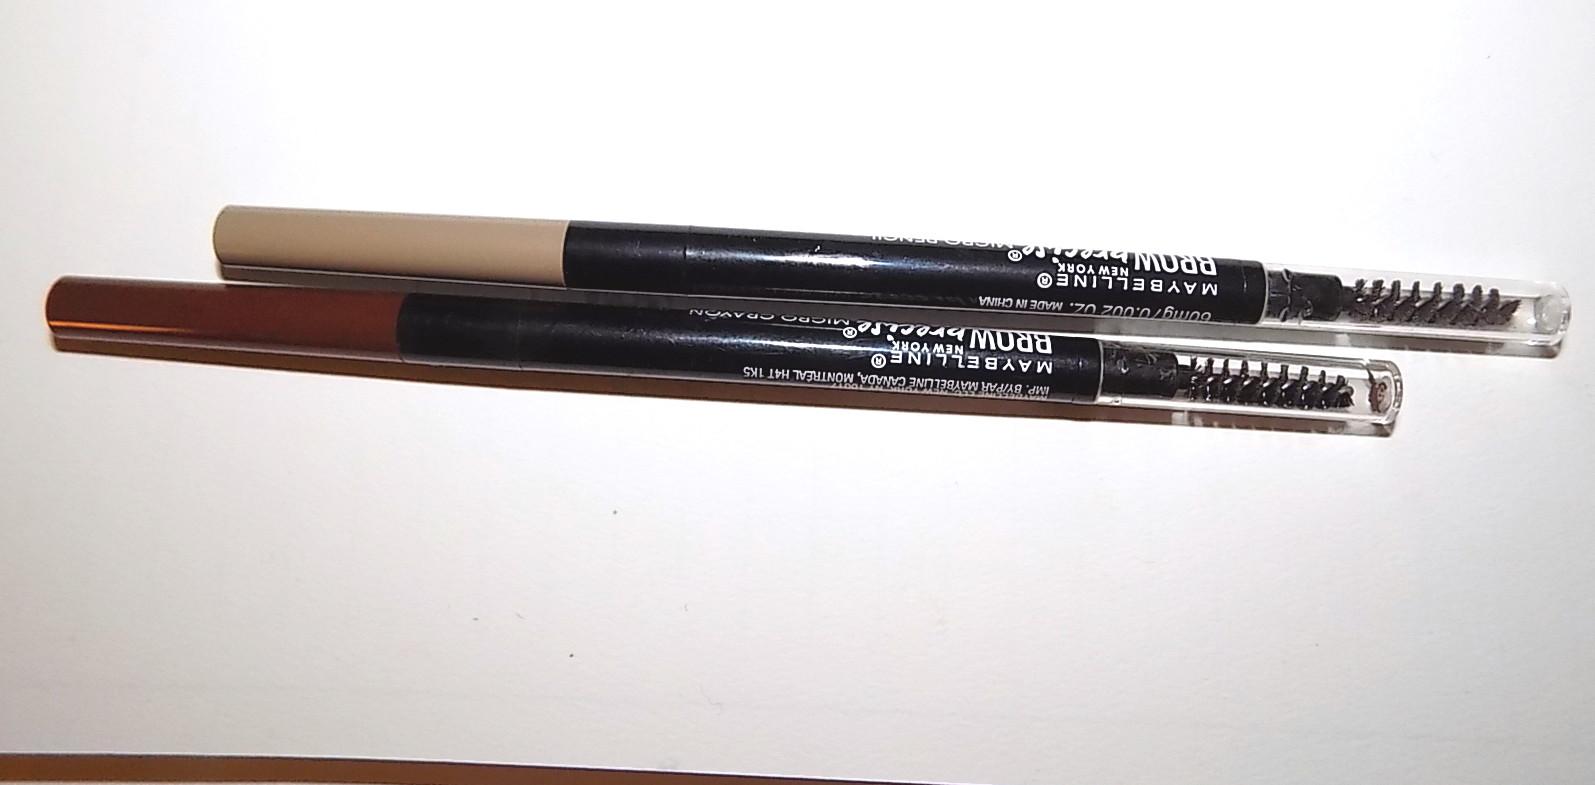 The Beauty Alchemist Maybelline Brow Precise Micro Pencil